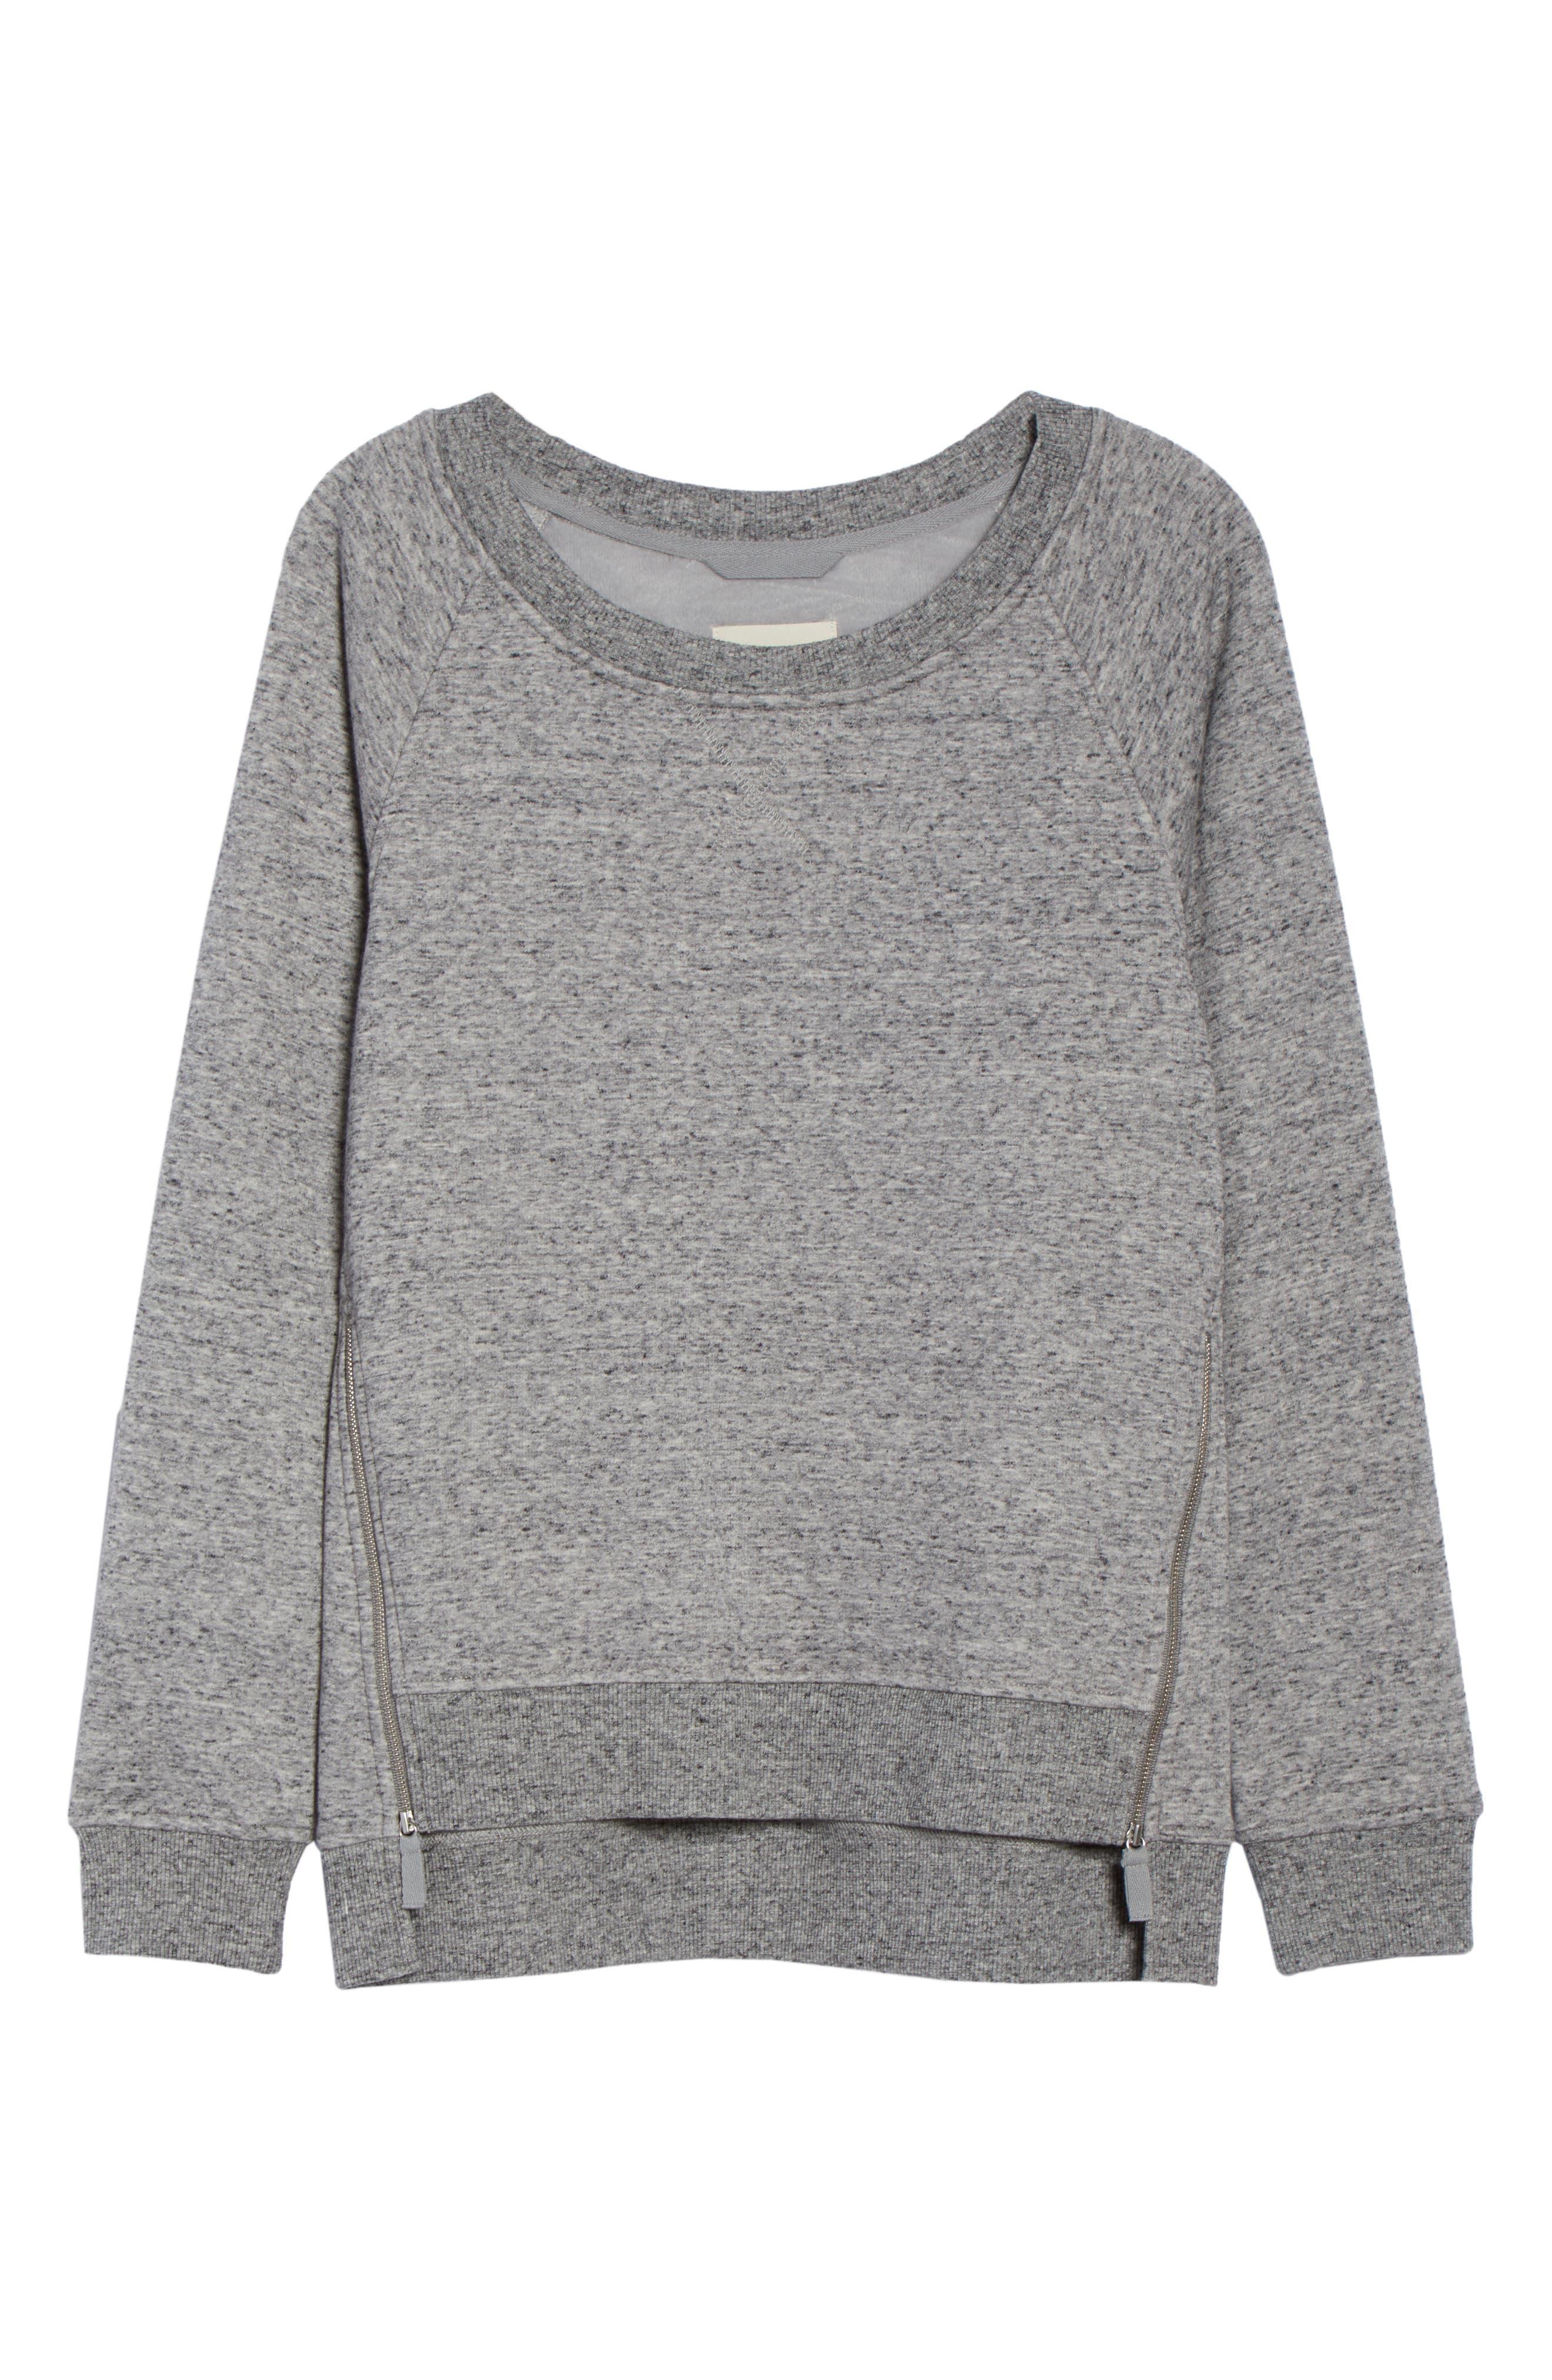 Morgan Sweatshirt,                             Alternate thumbnail 6, color,                             GREY HEATHER